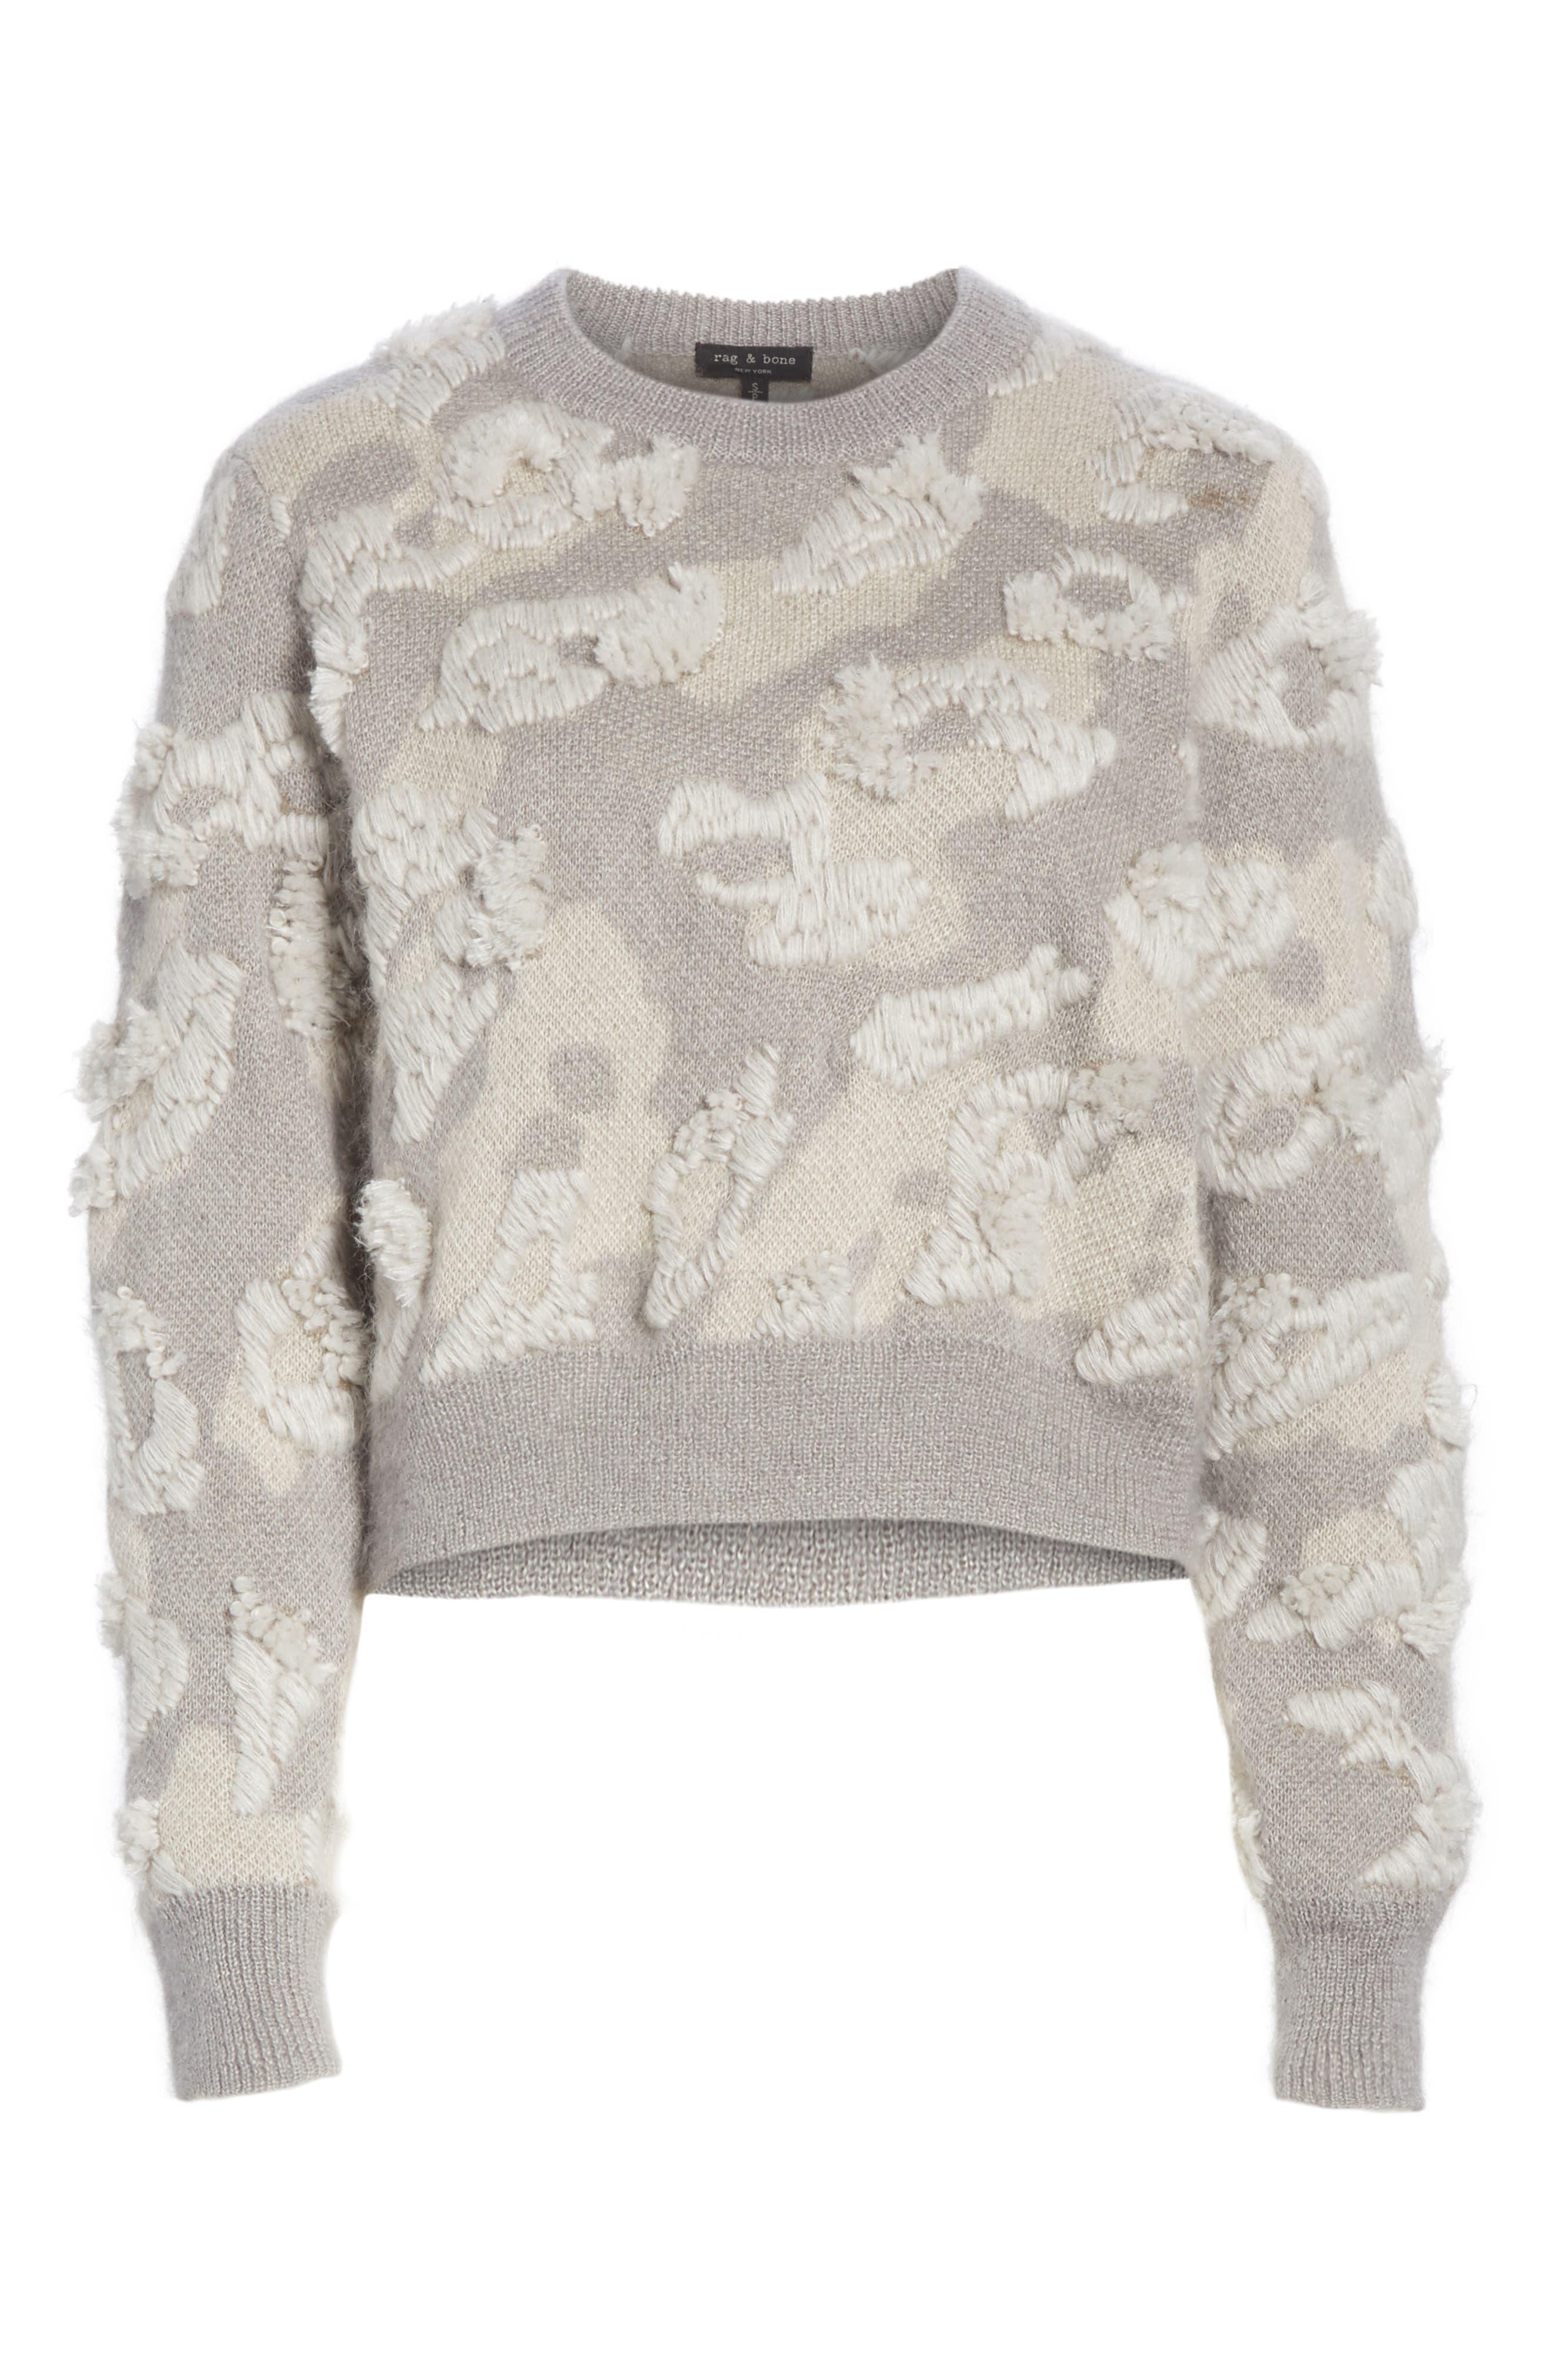 RAG & BONE,                             Embroidered Leopard Spot Sweater,                             Alternate thumbnail 6, color,                             900